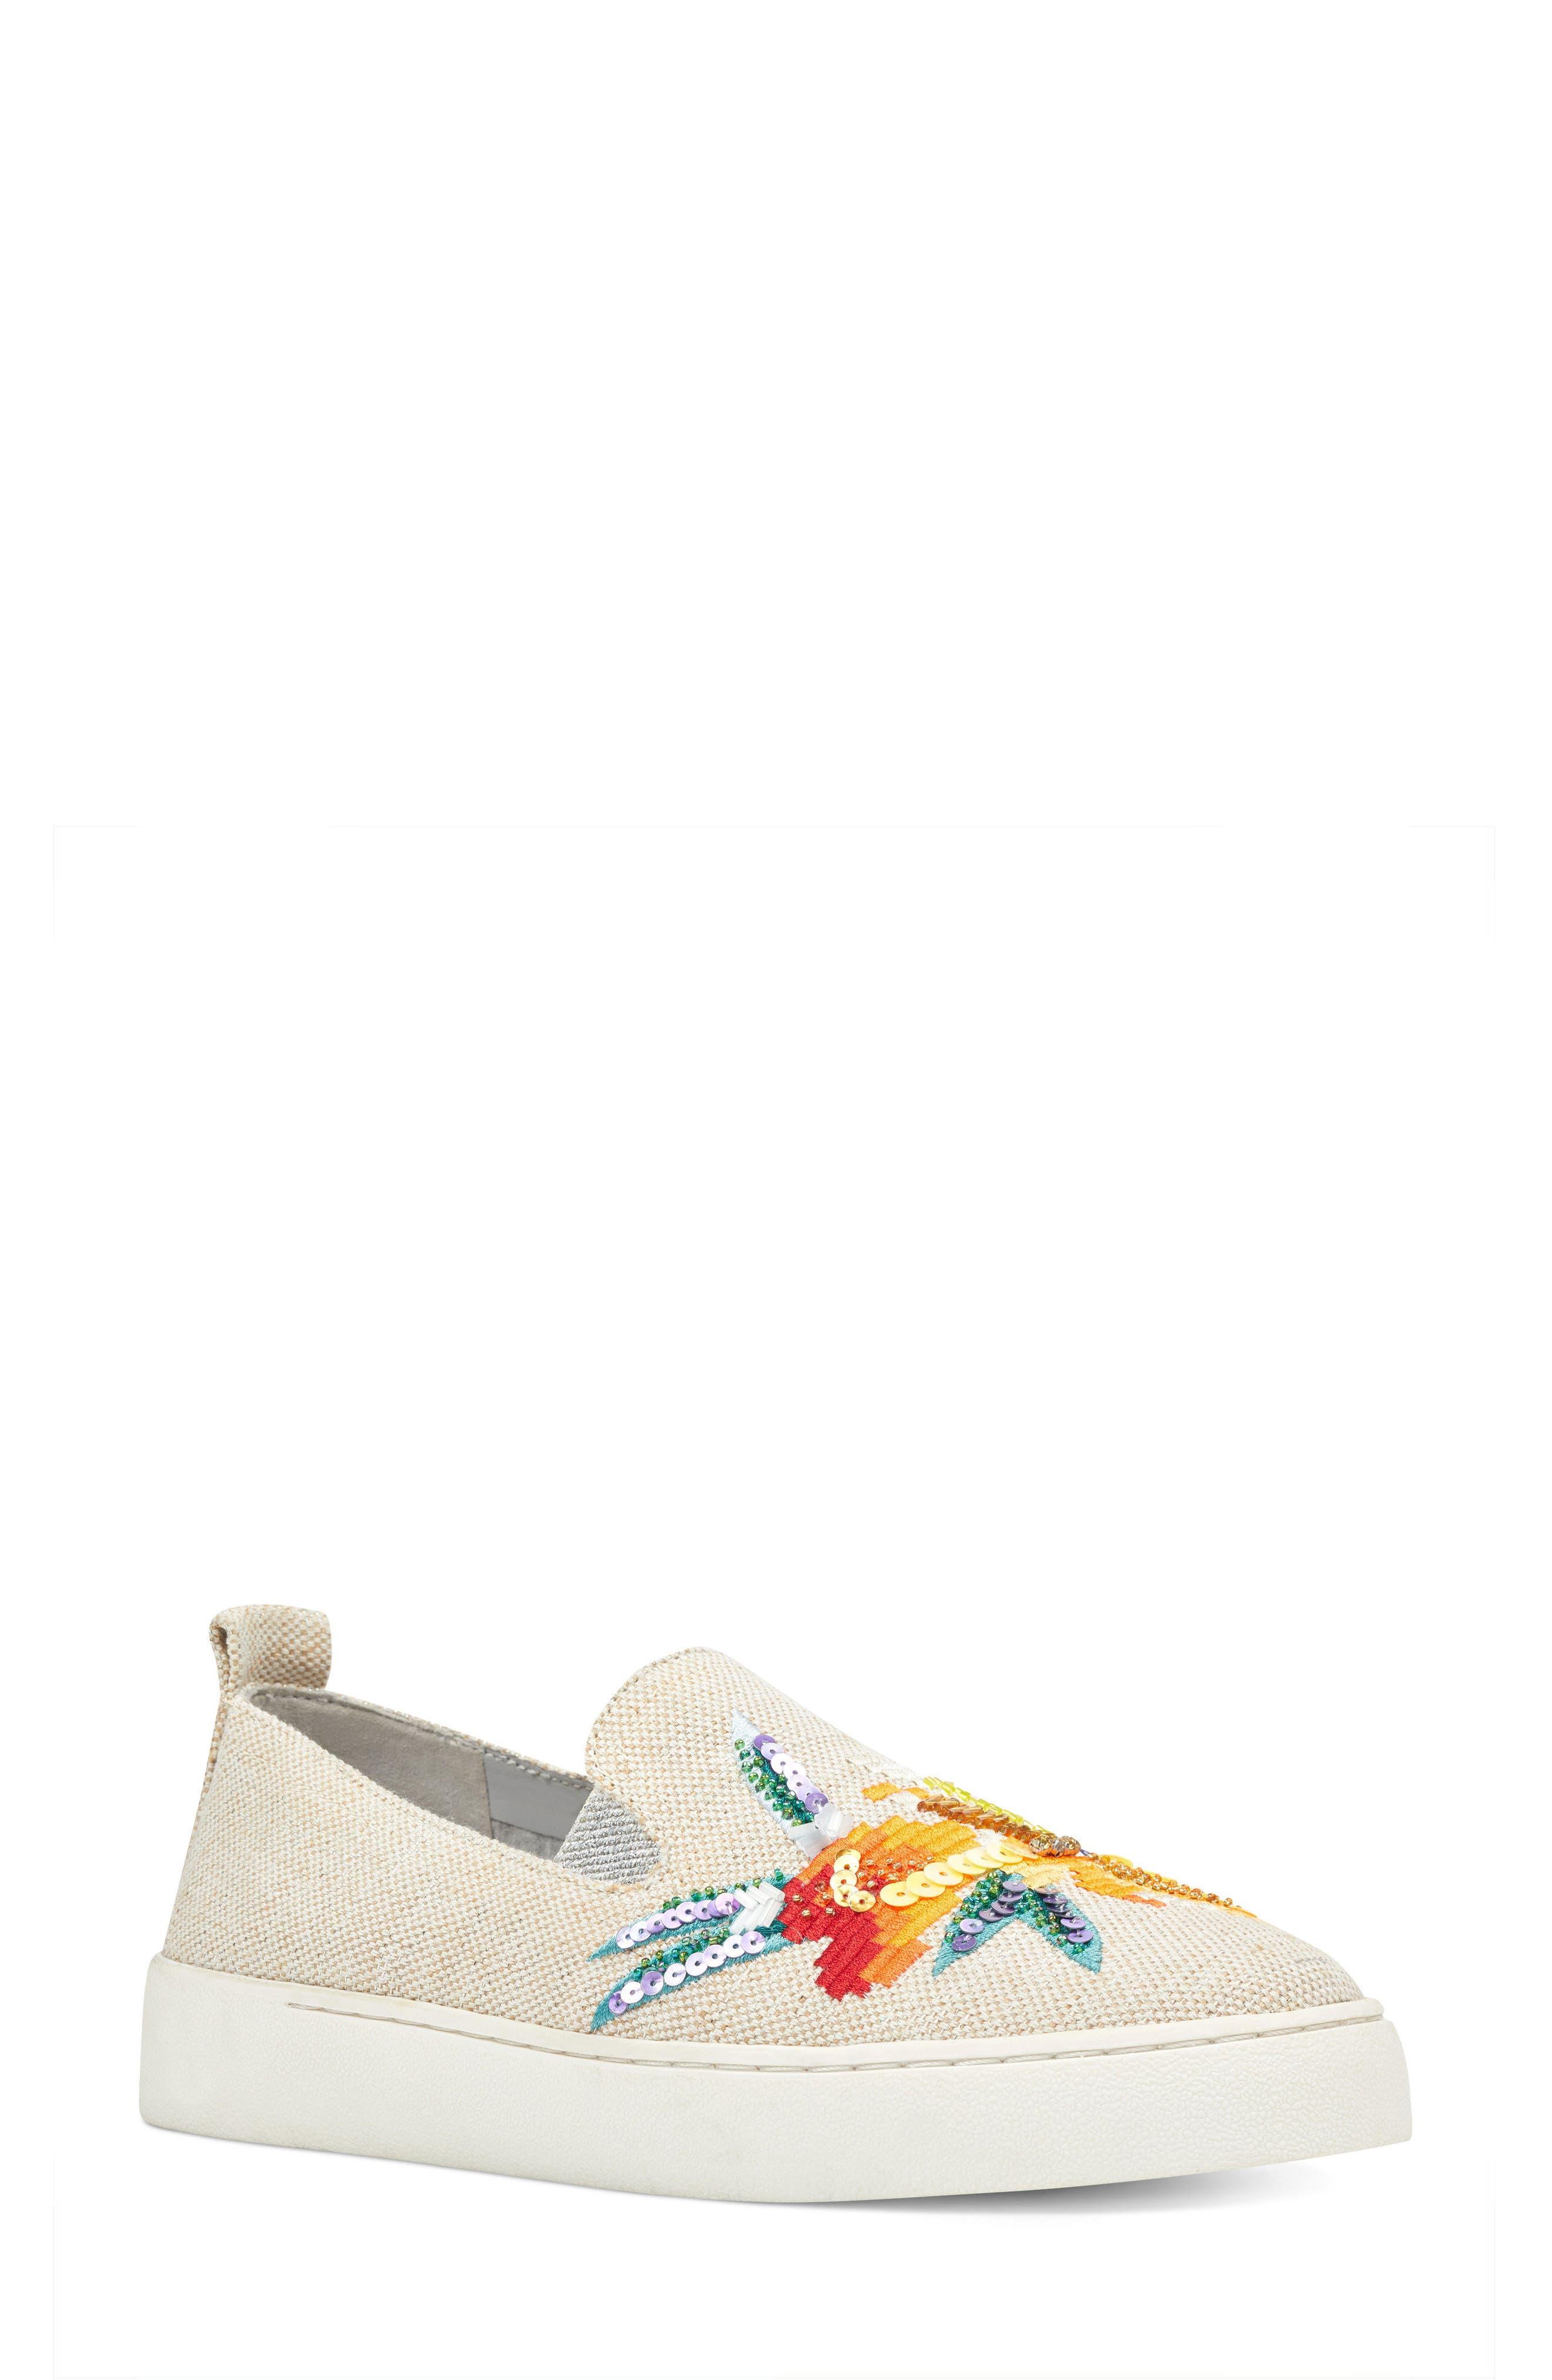 Playavista Slip-On Sneaker,                             Main thumbnail 1, color,                             270